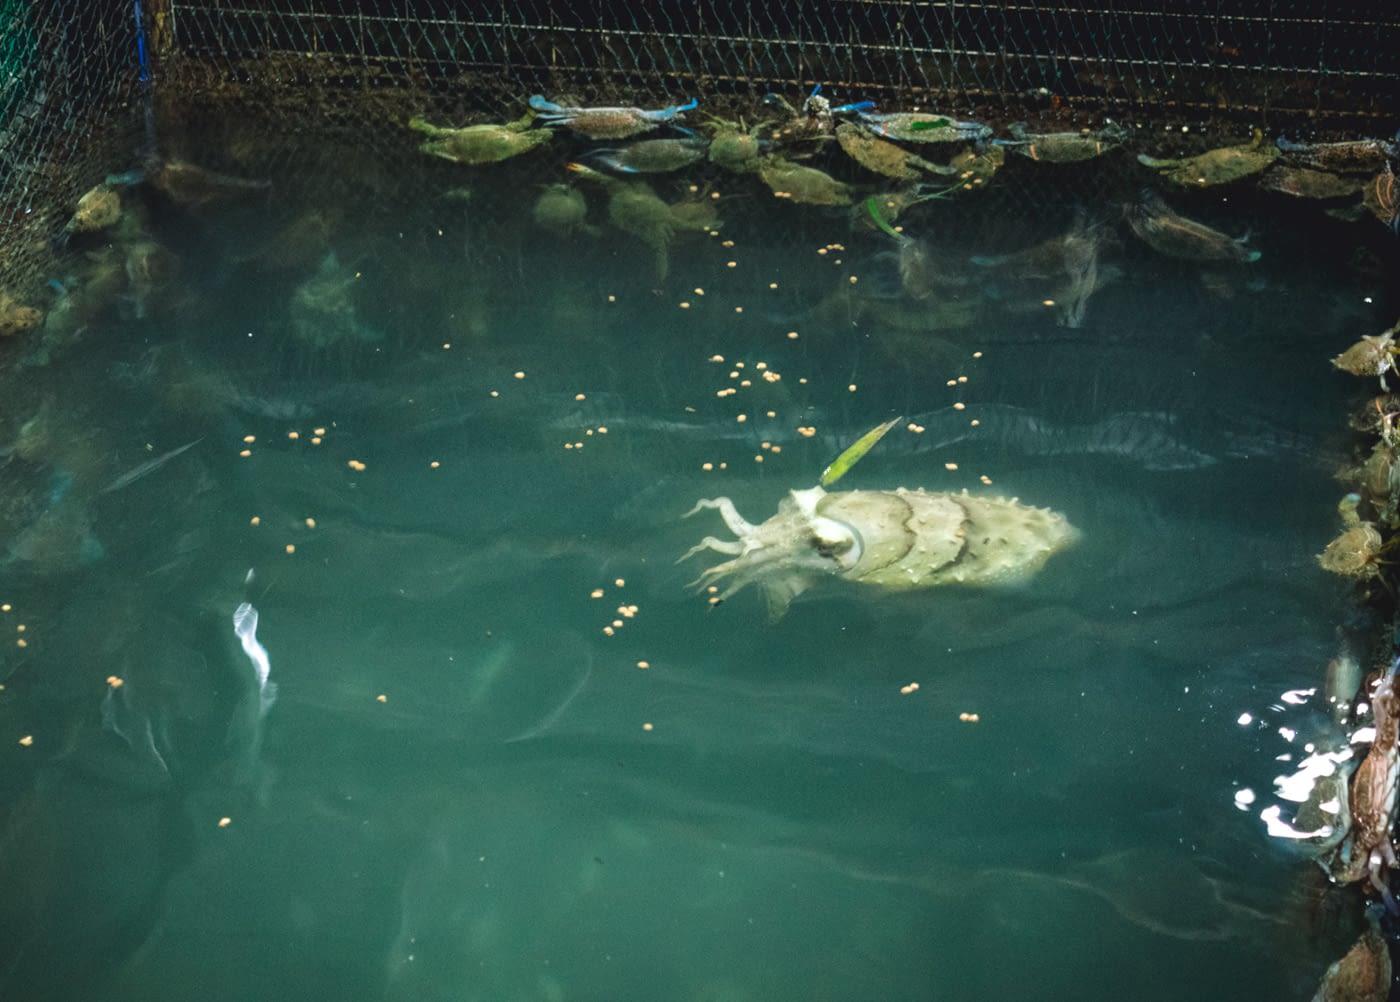 Indonesia - Montigo - Albino crayfish